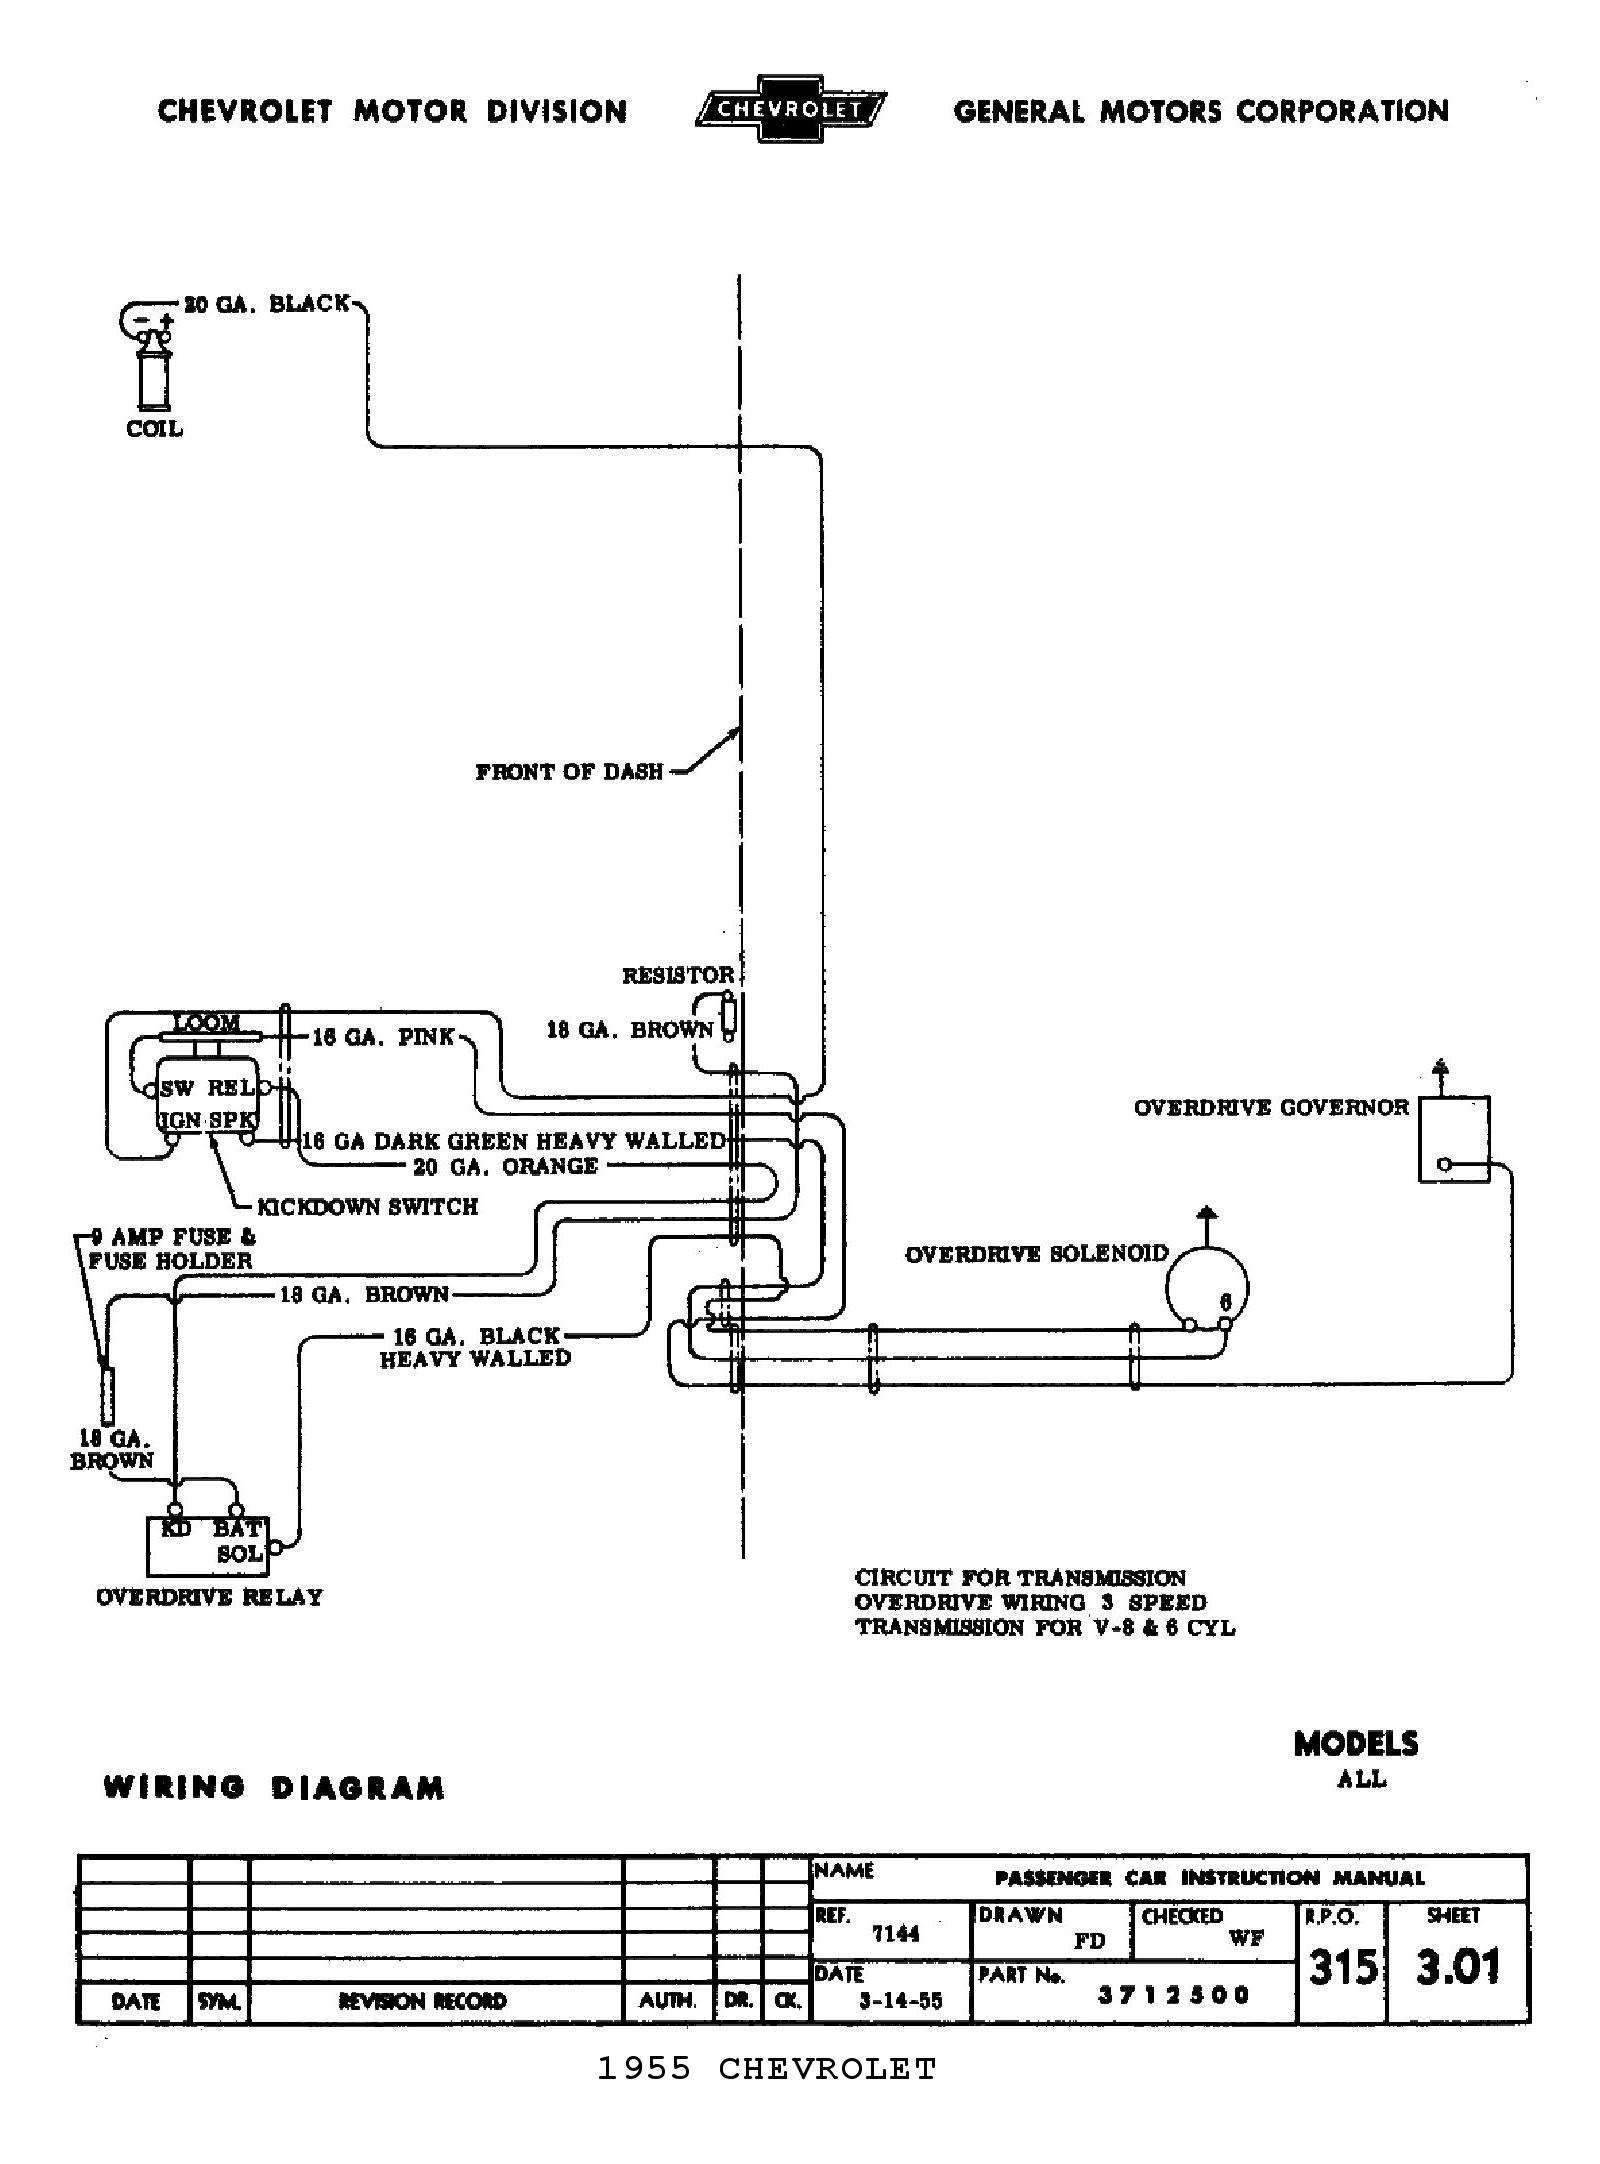 Car Wiring Harness Diagram Chevy Wiring Diagrams Of Car Wiring Harness Diagram